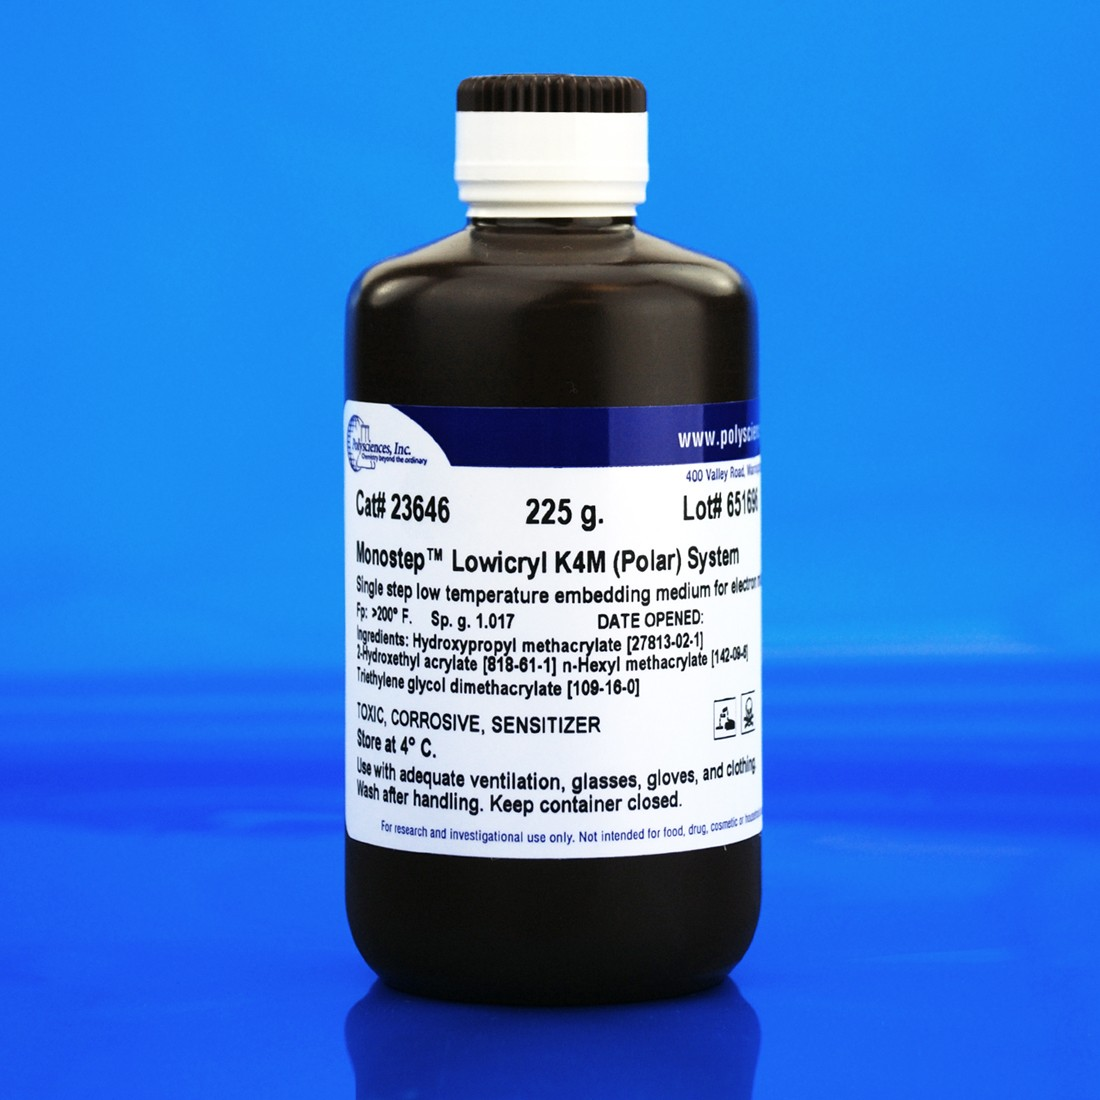 MonoStep™ Lowicryl K4M Polar Embedding Media